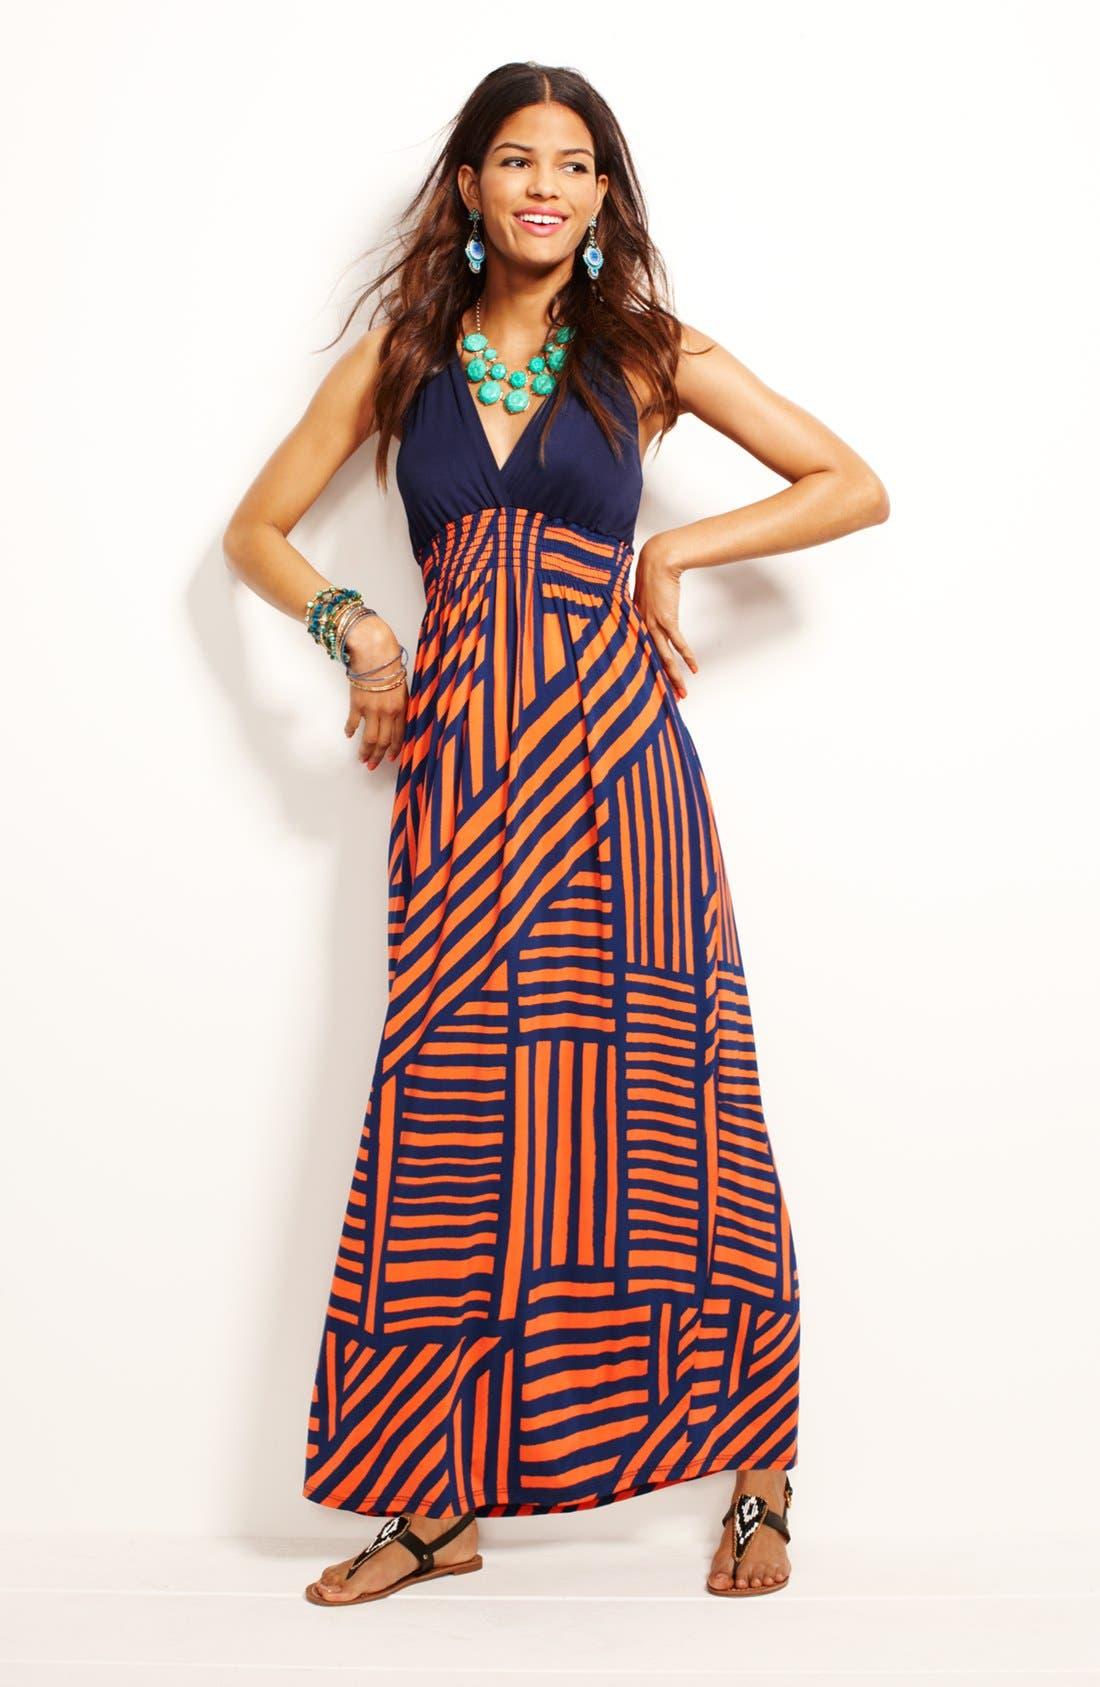 Main Image - FELICITY & COCO Maxi Dress & Accessories